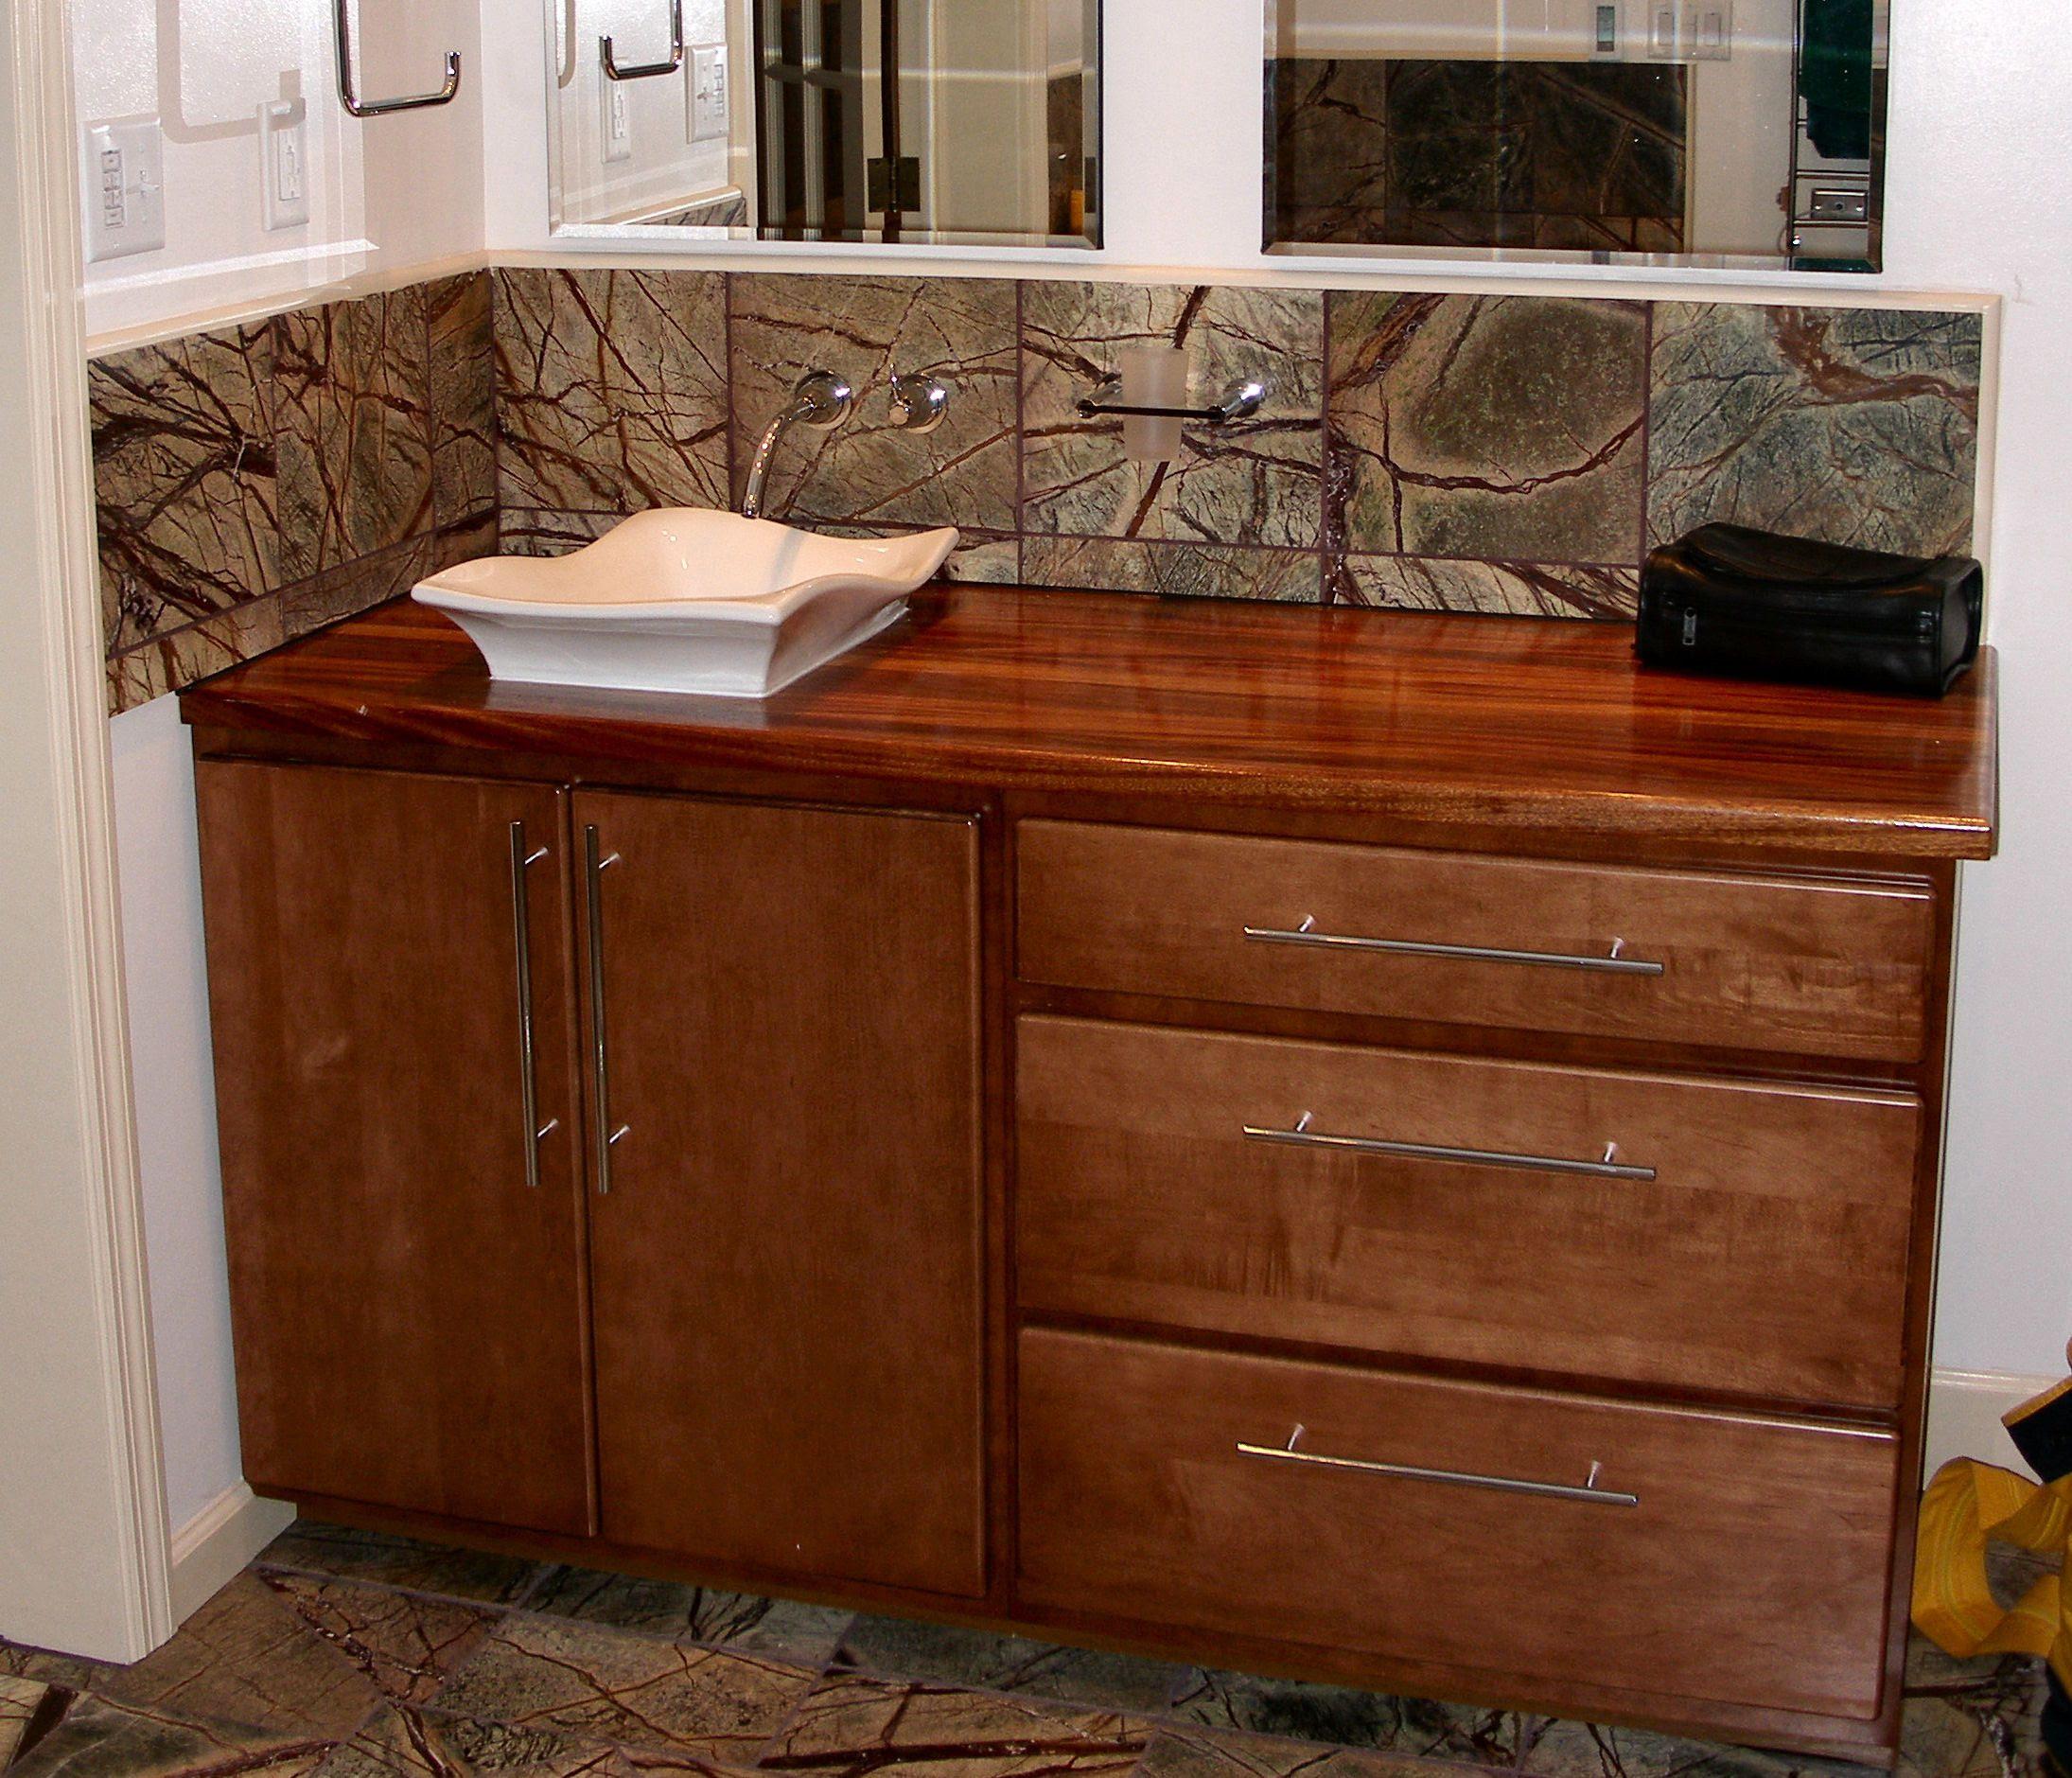 Sink Cutouts In Custom Wood Countertops